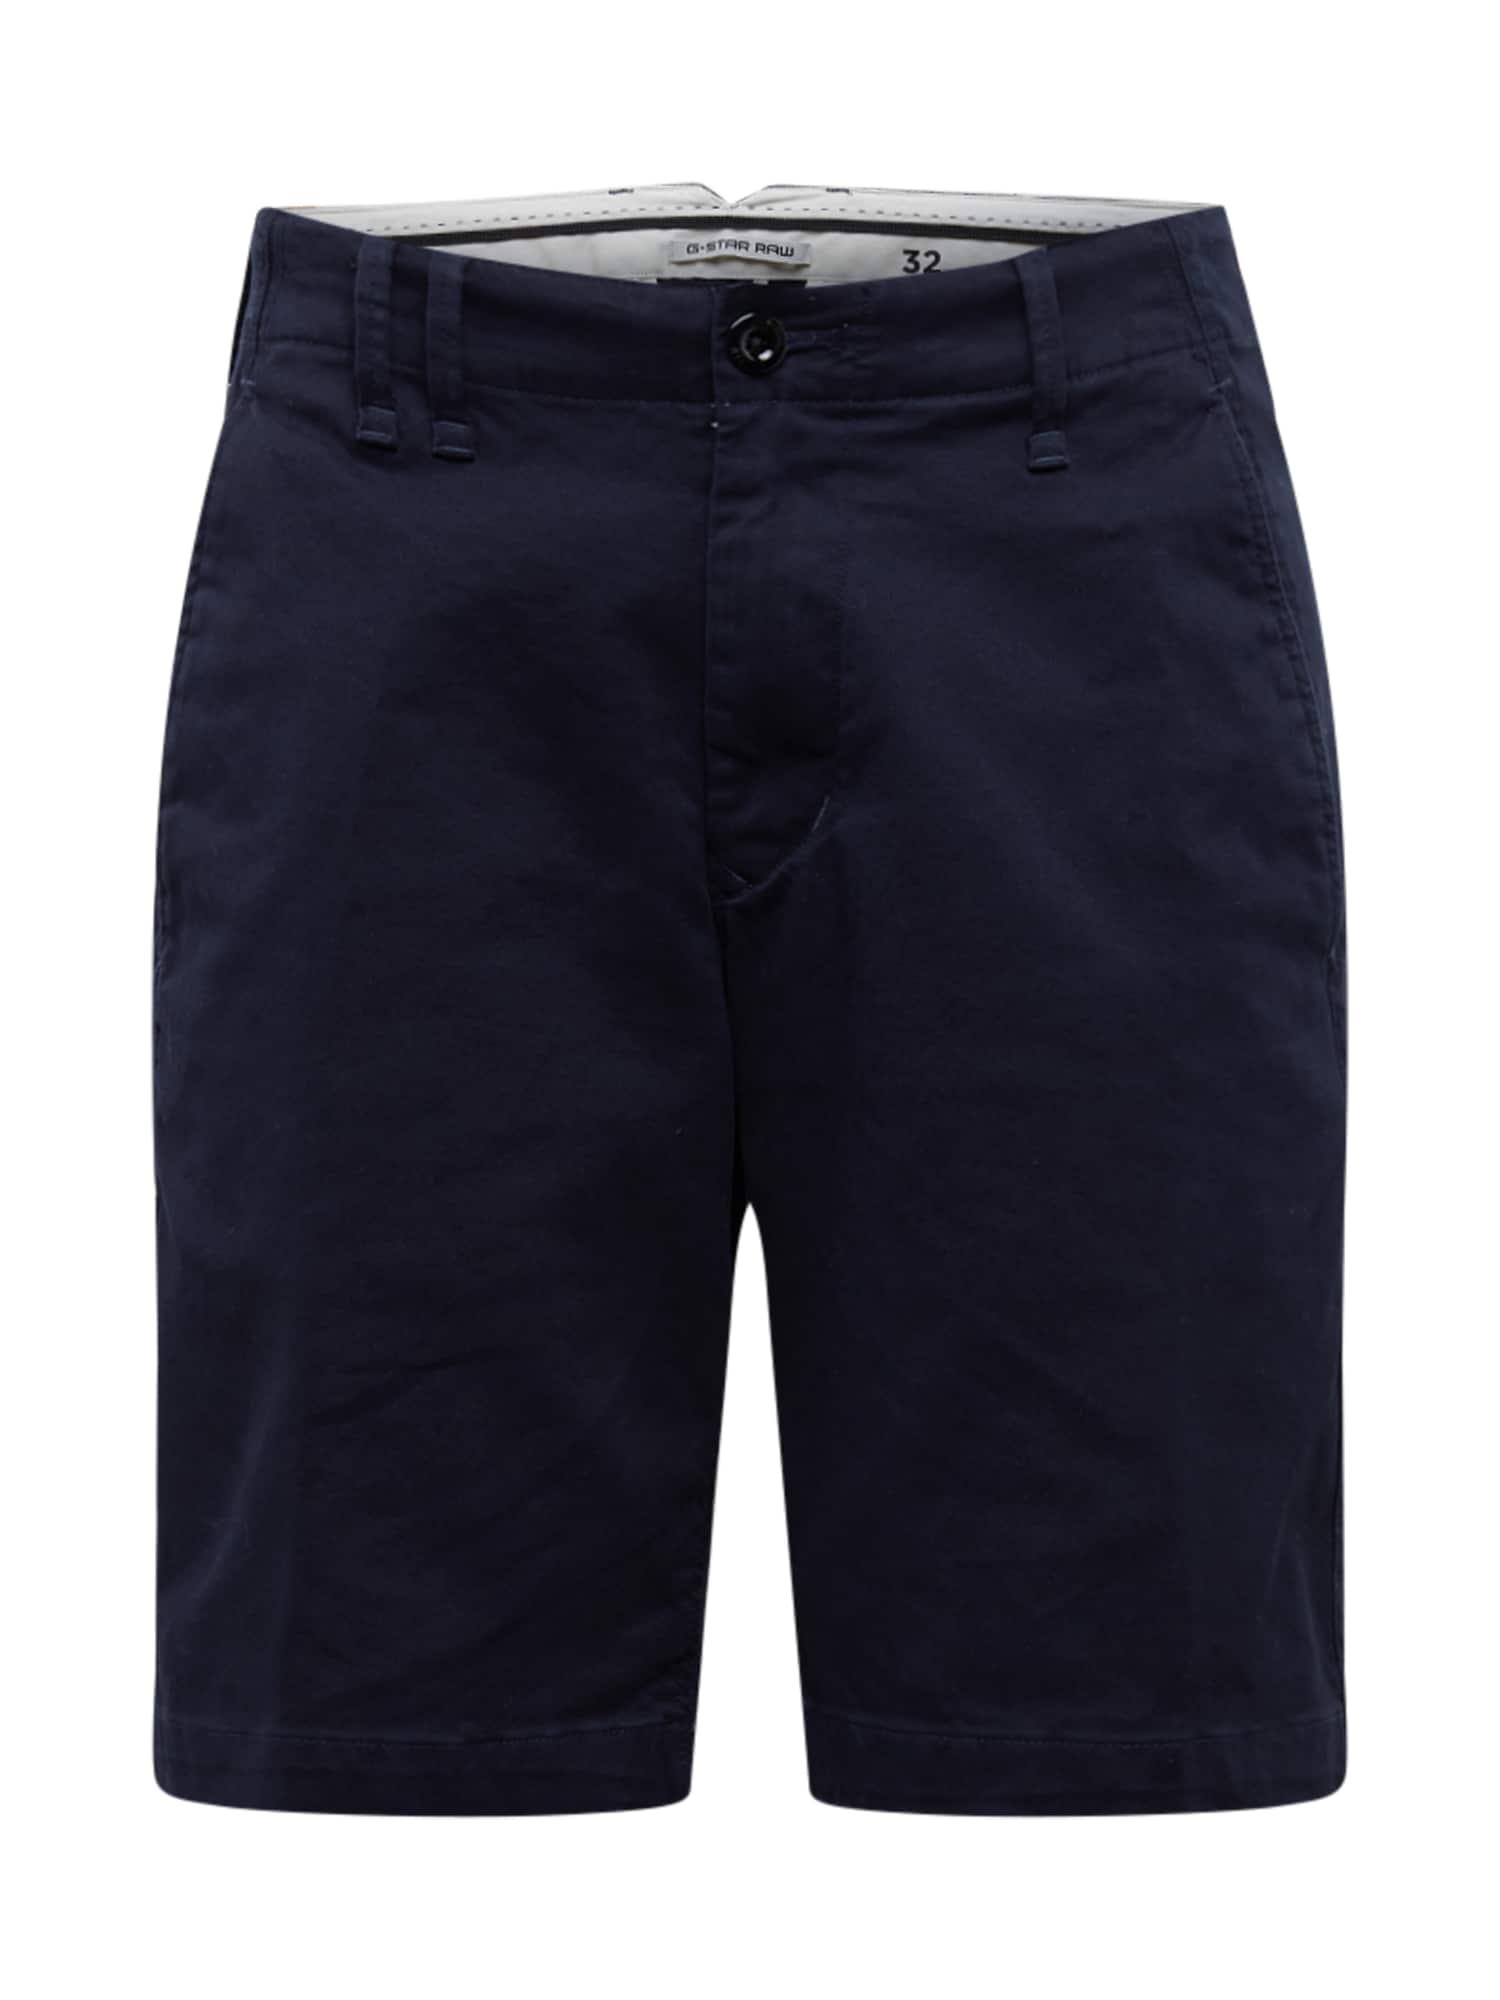 G-Star RAW Kelnės 'Vetar' tamsiai mėlyna